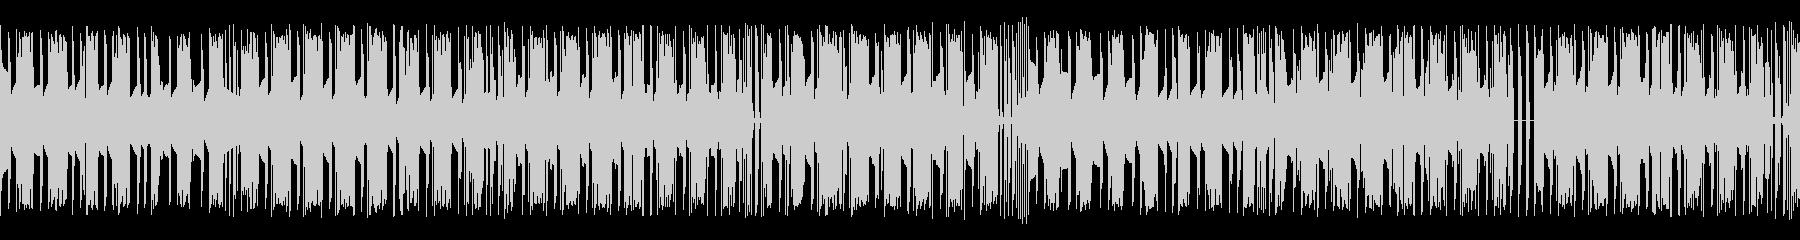 BGM008-03 エレピとアナログド…の未再生の波形